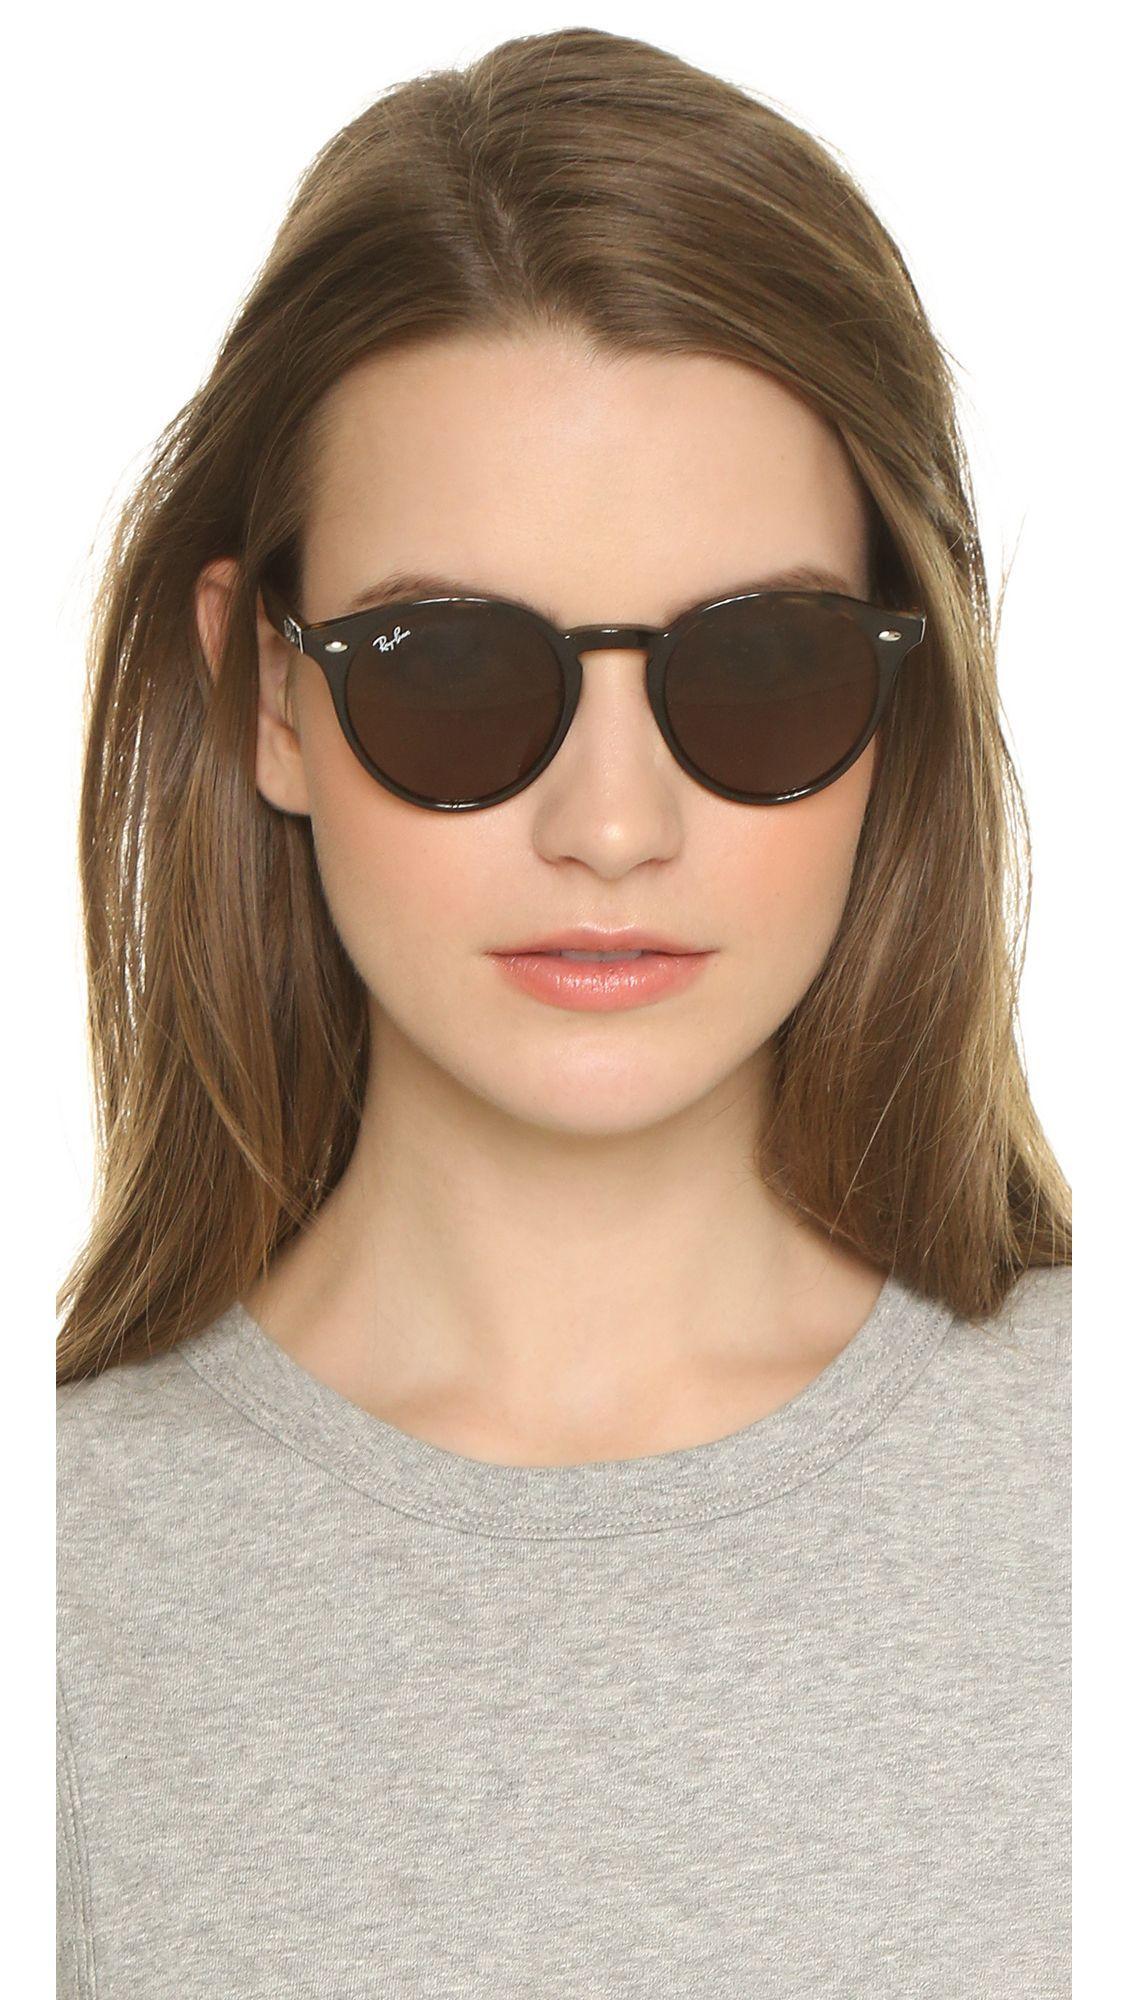 fbb674053a Ray-Ban Highstreet Round Sunglasses